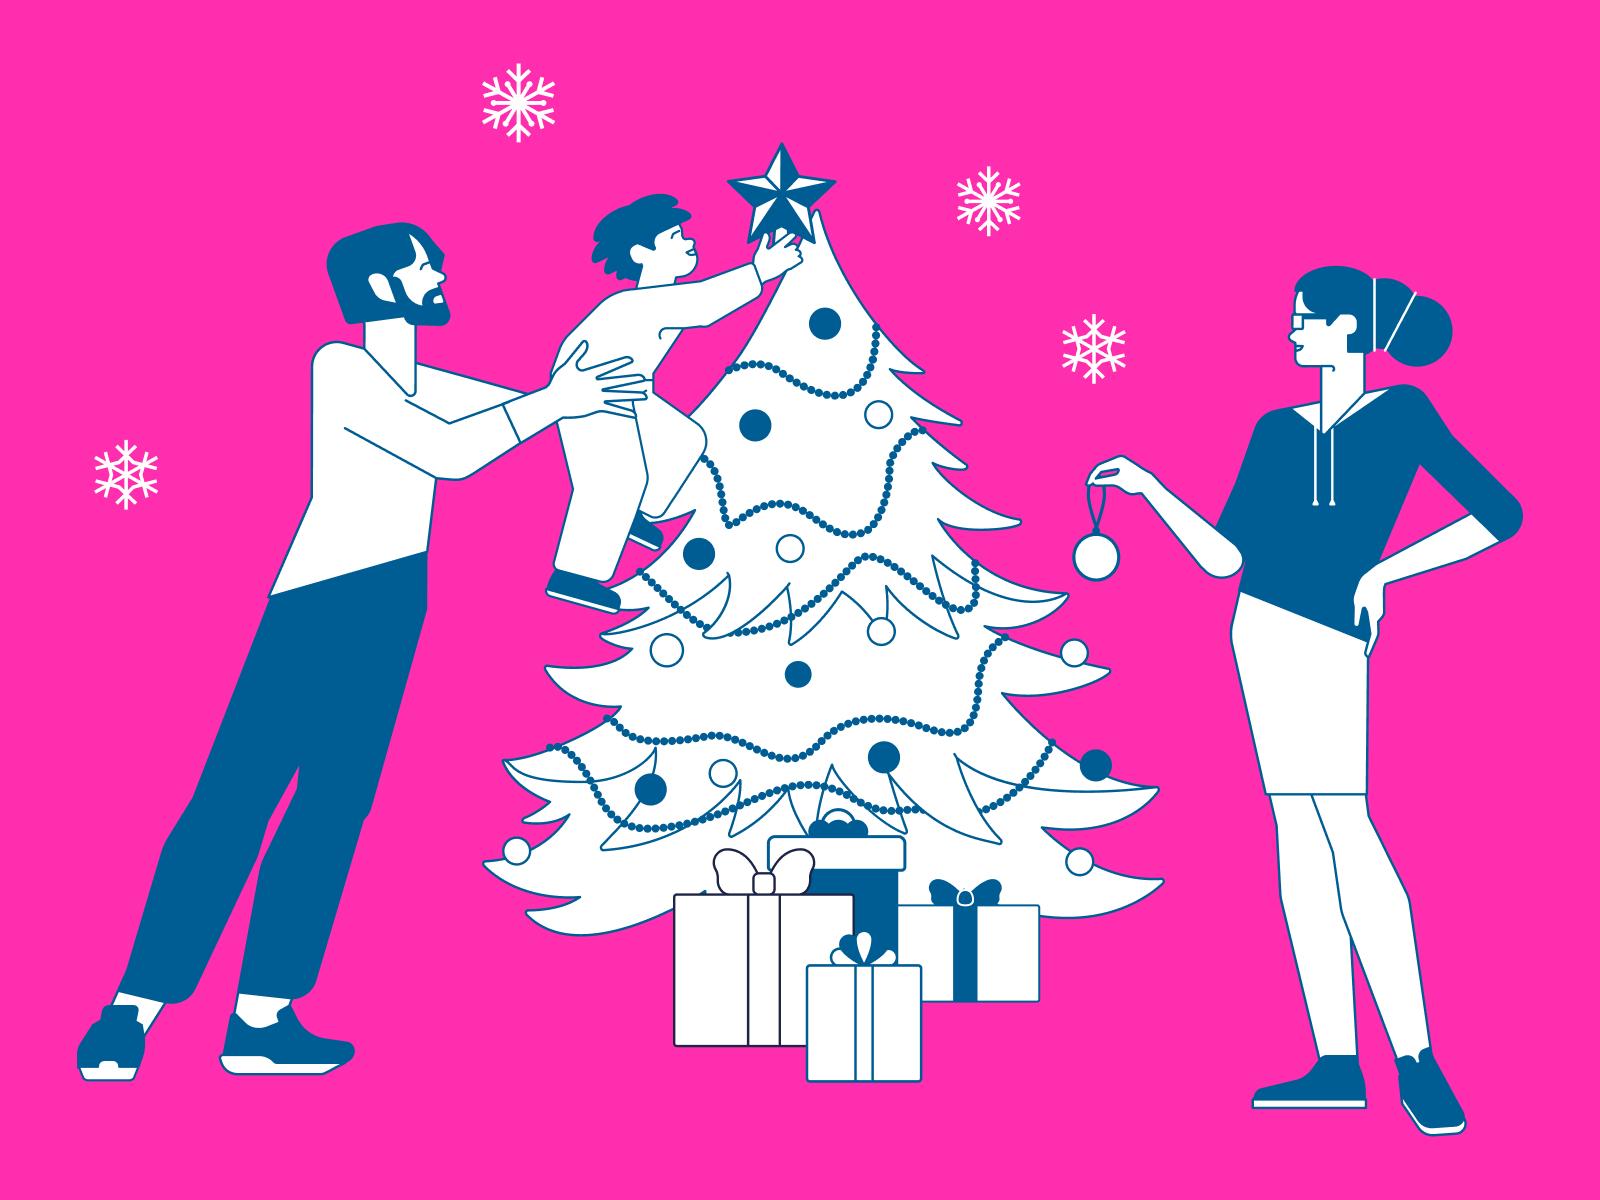 icons8 christmas illustration urban line